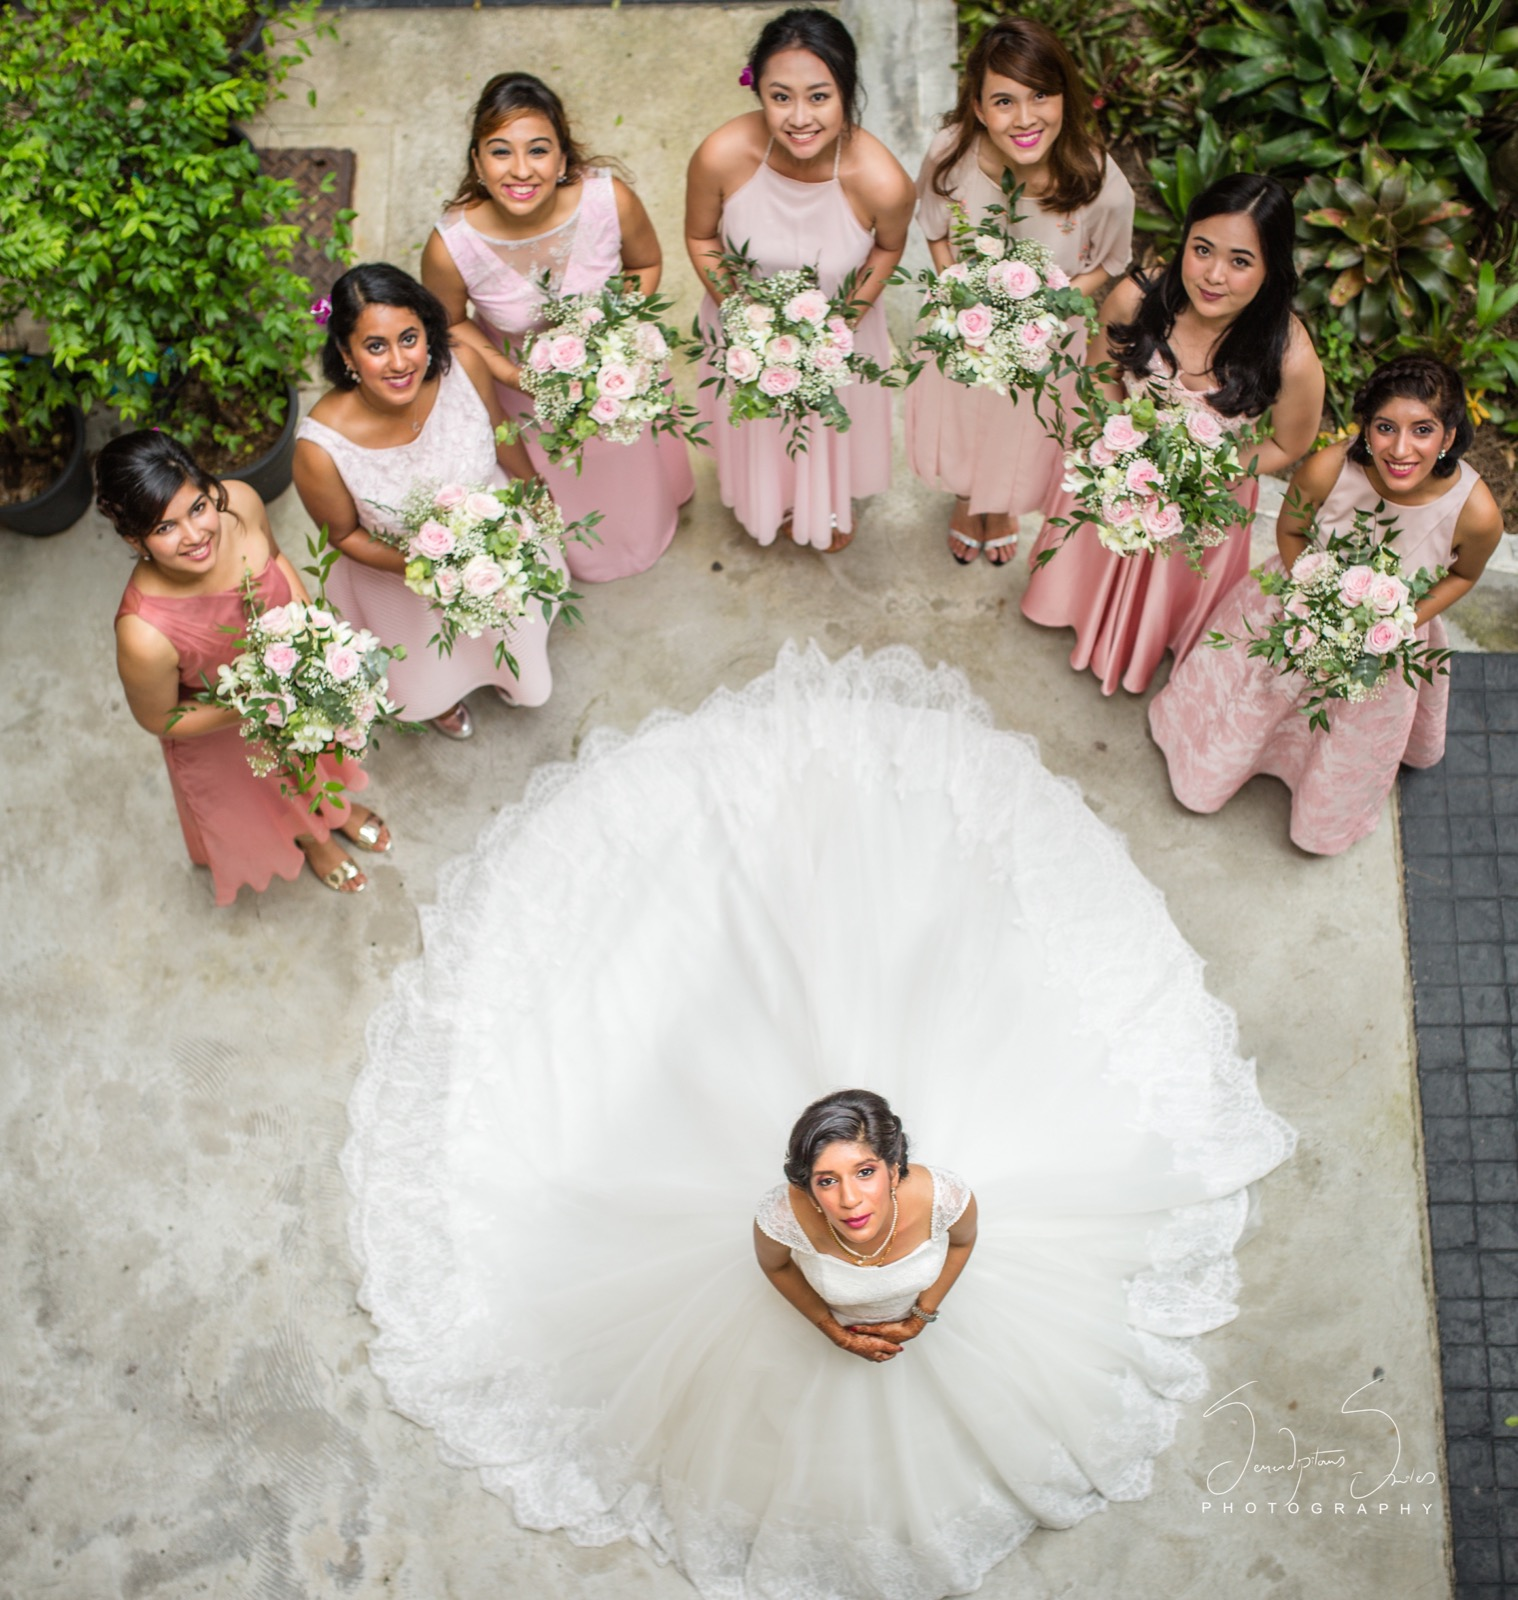 Hindu-Christian Kerala Wedding Held in Phuket, Thailand